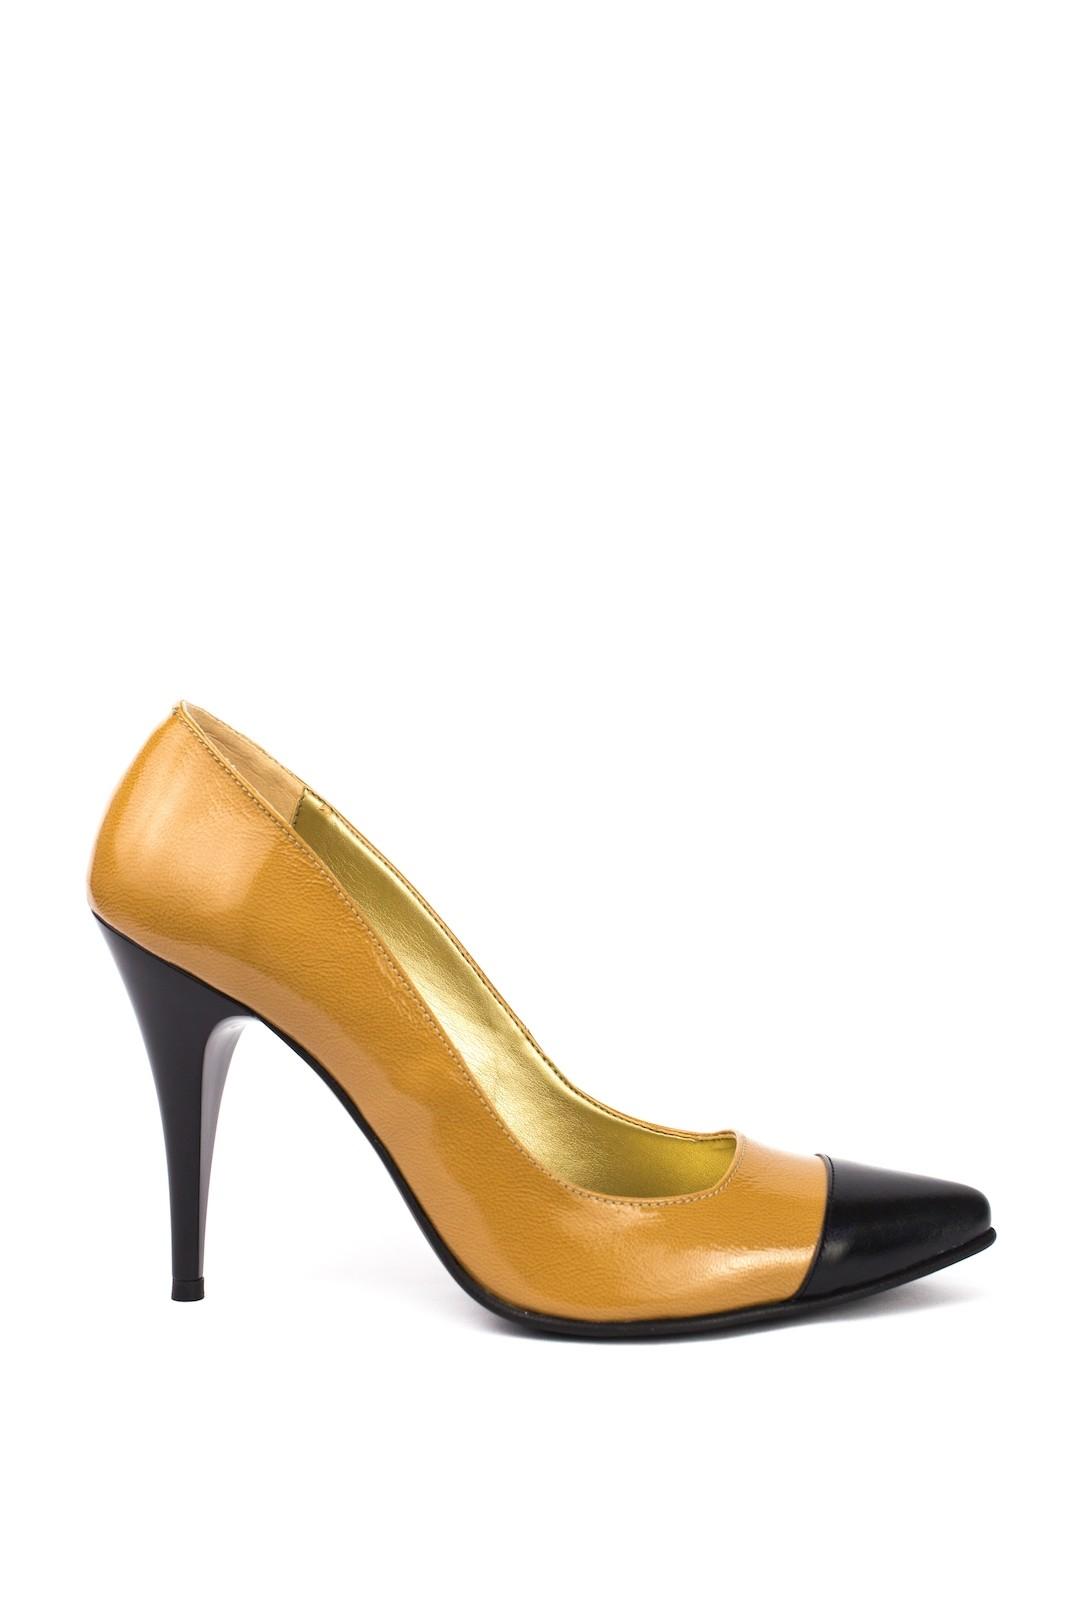 Pantofi Dama piele naturala bej Ofelia